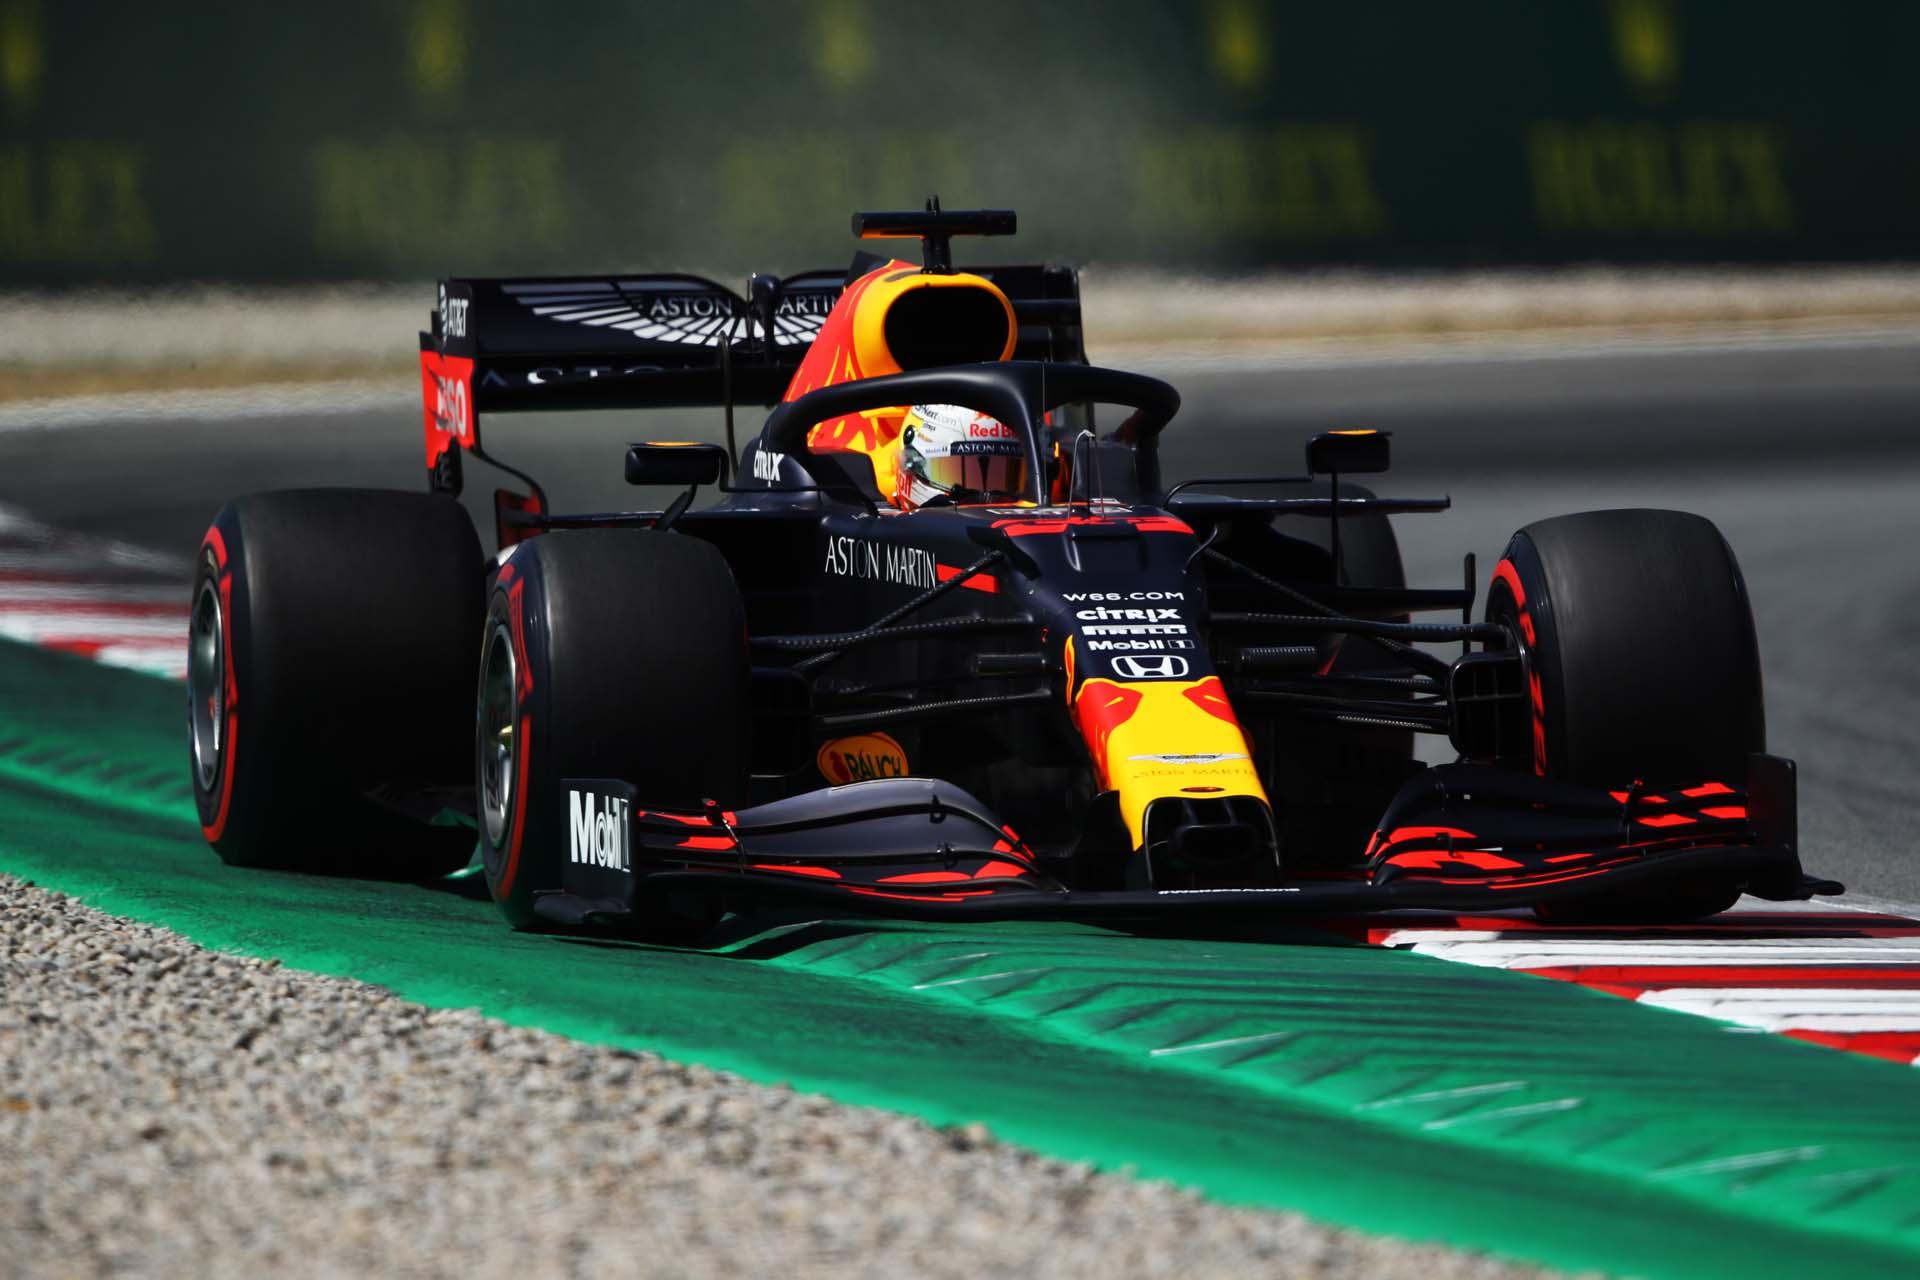 F1 Grand Prix of Spain - Final Practice